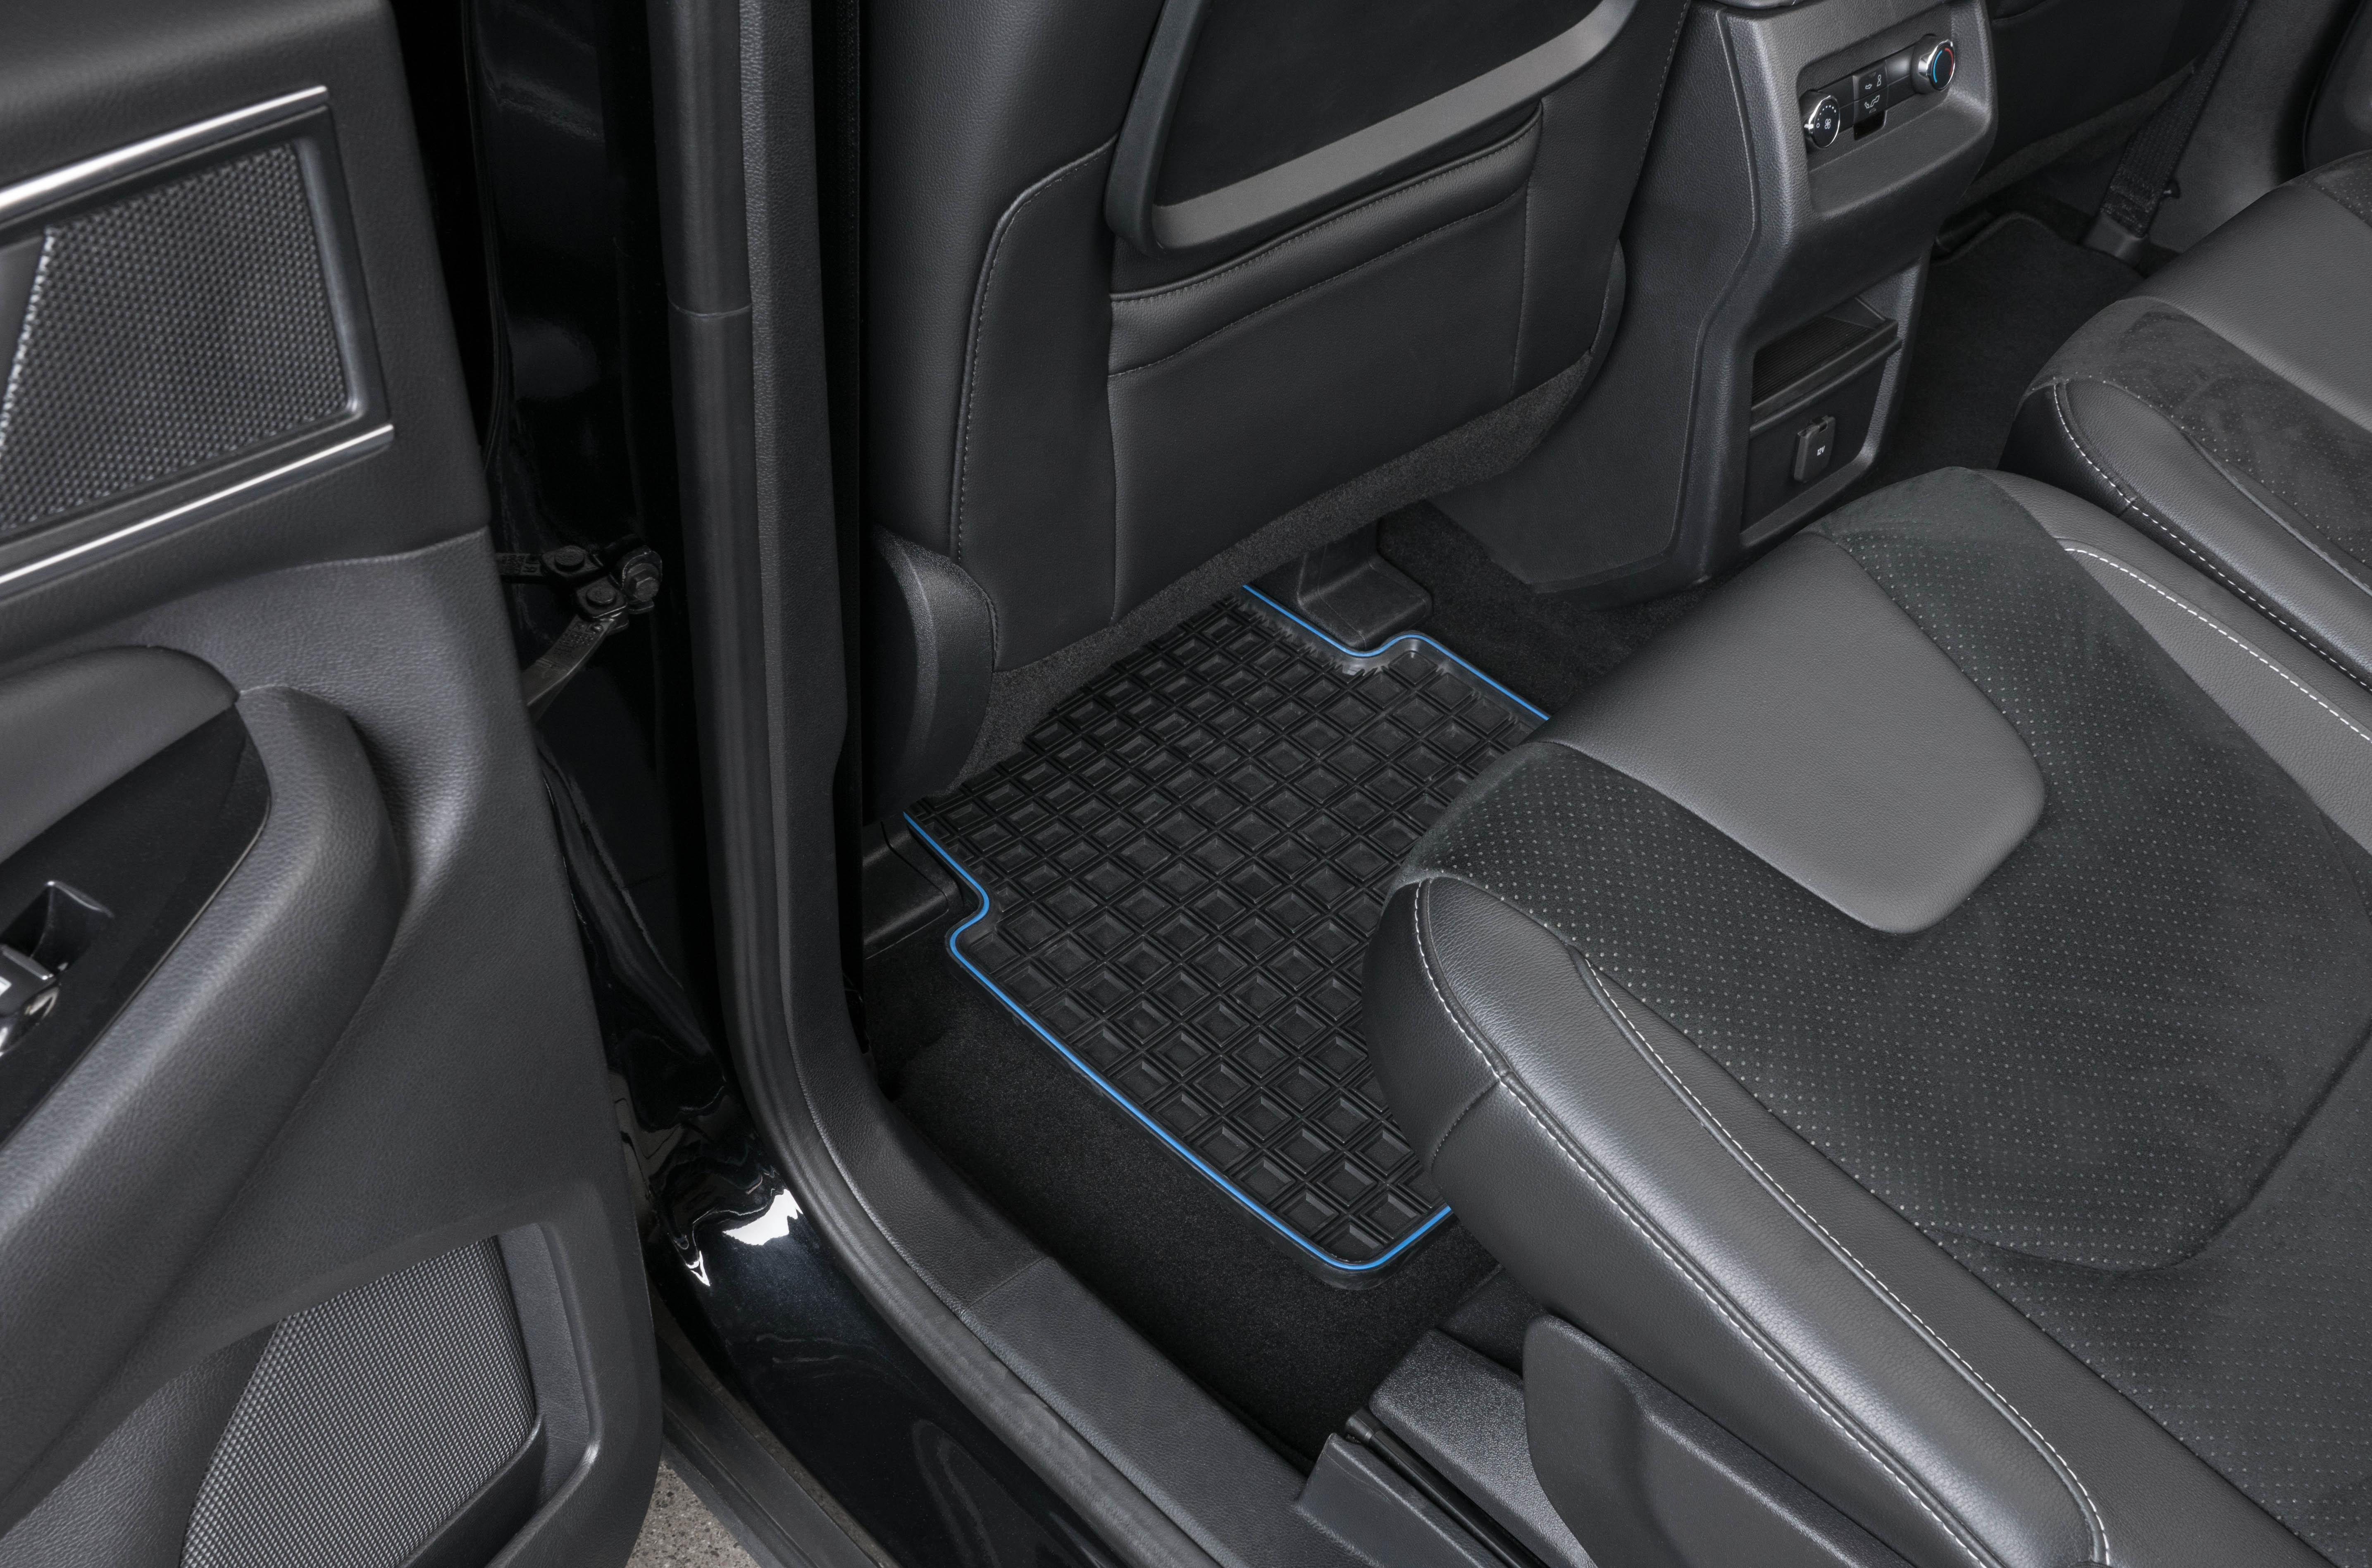 14900 Autofußmatten WALSER 14900 - Große Auswahl - stark reduziert